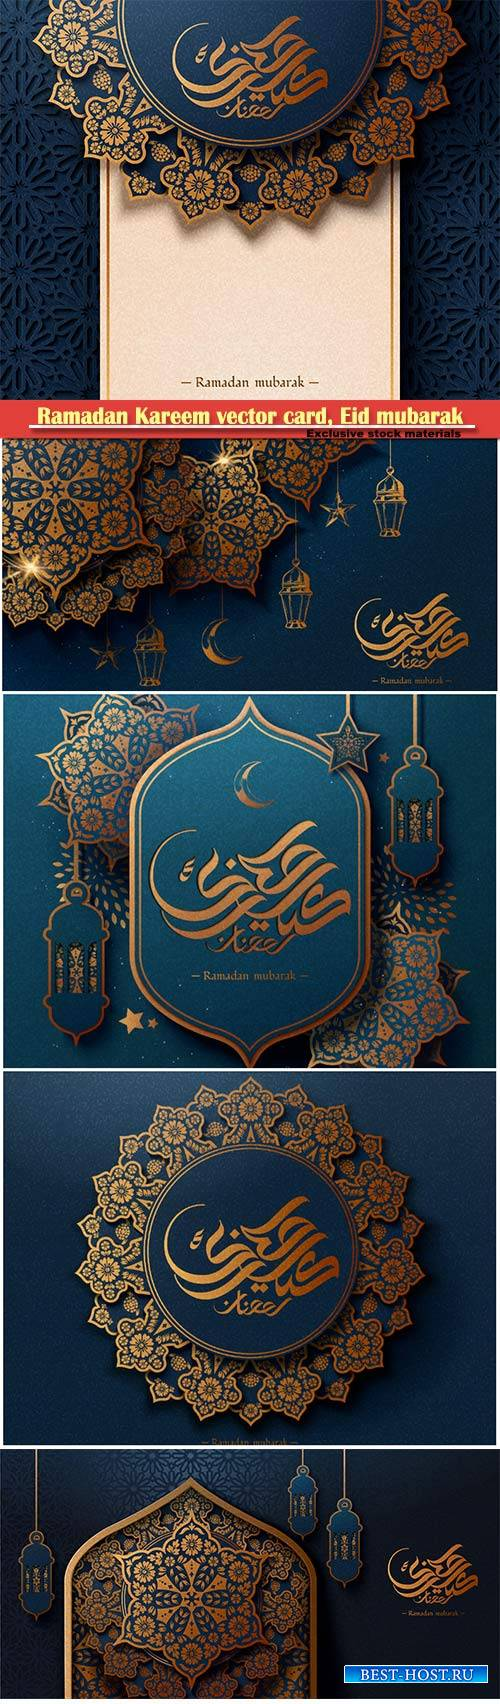 Ramadan Kareem vector card, Eid mubarak calligraphy design templates # 10